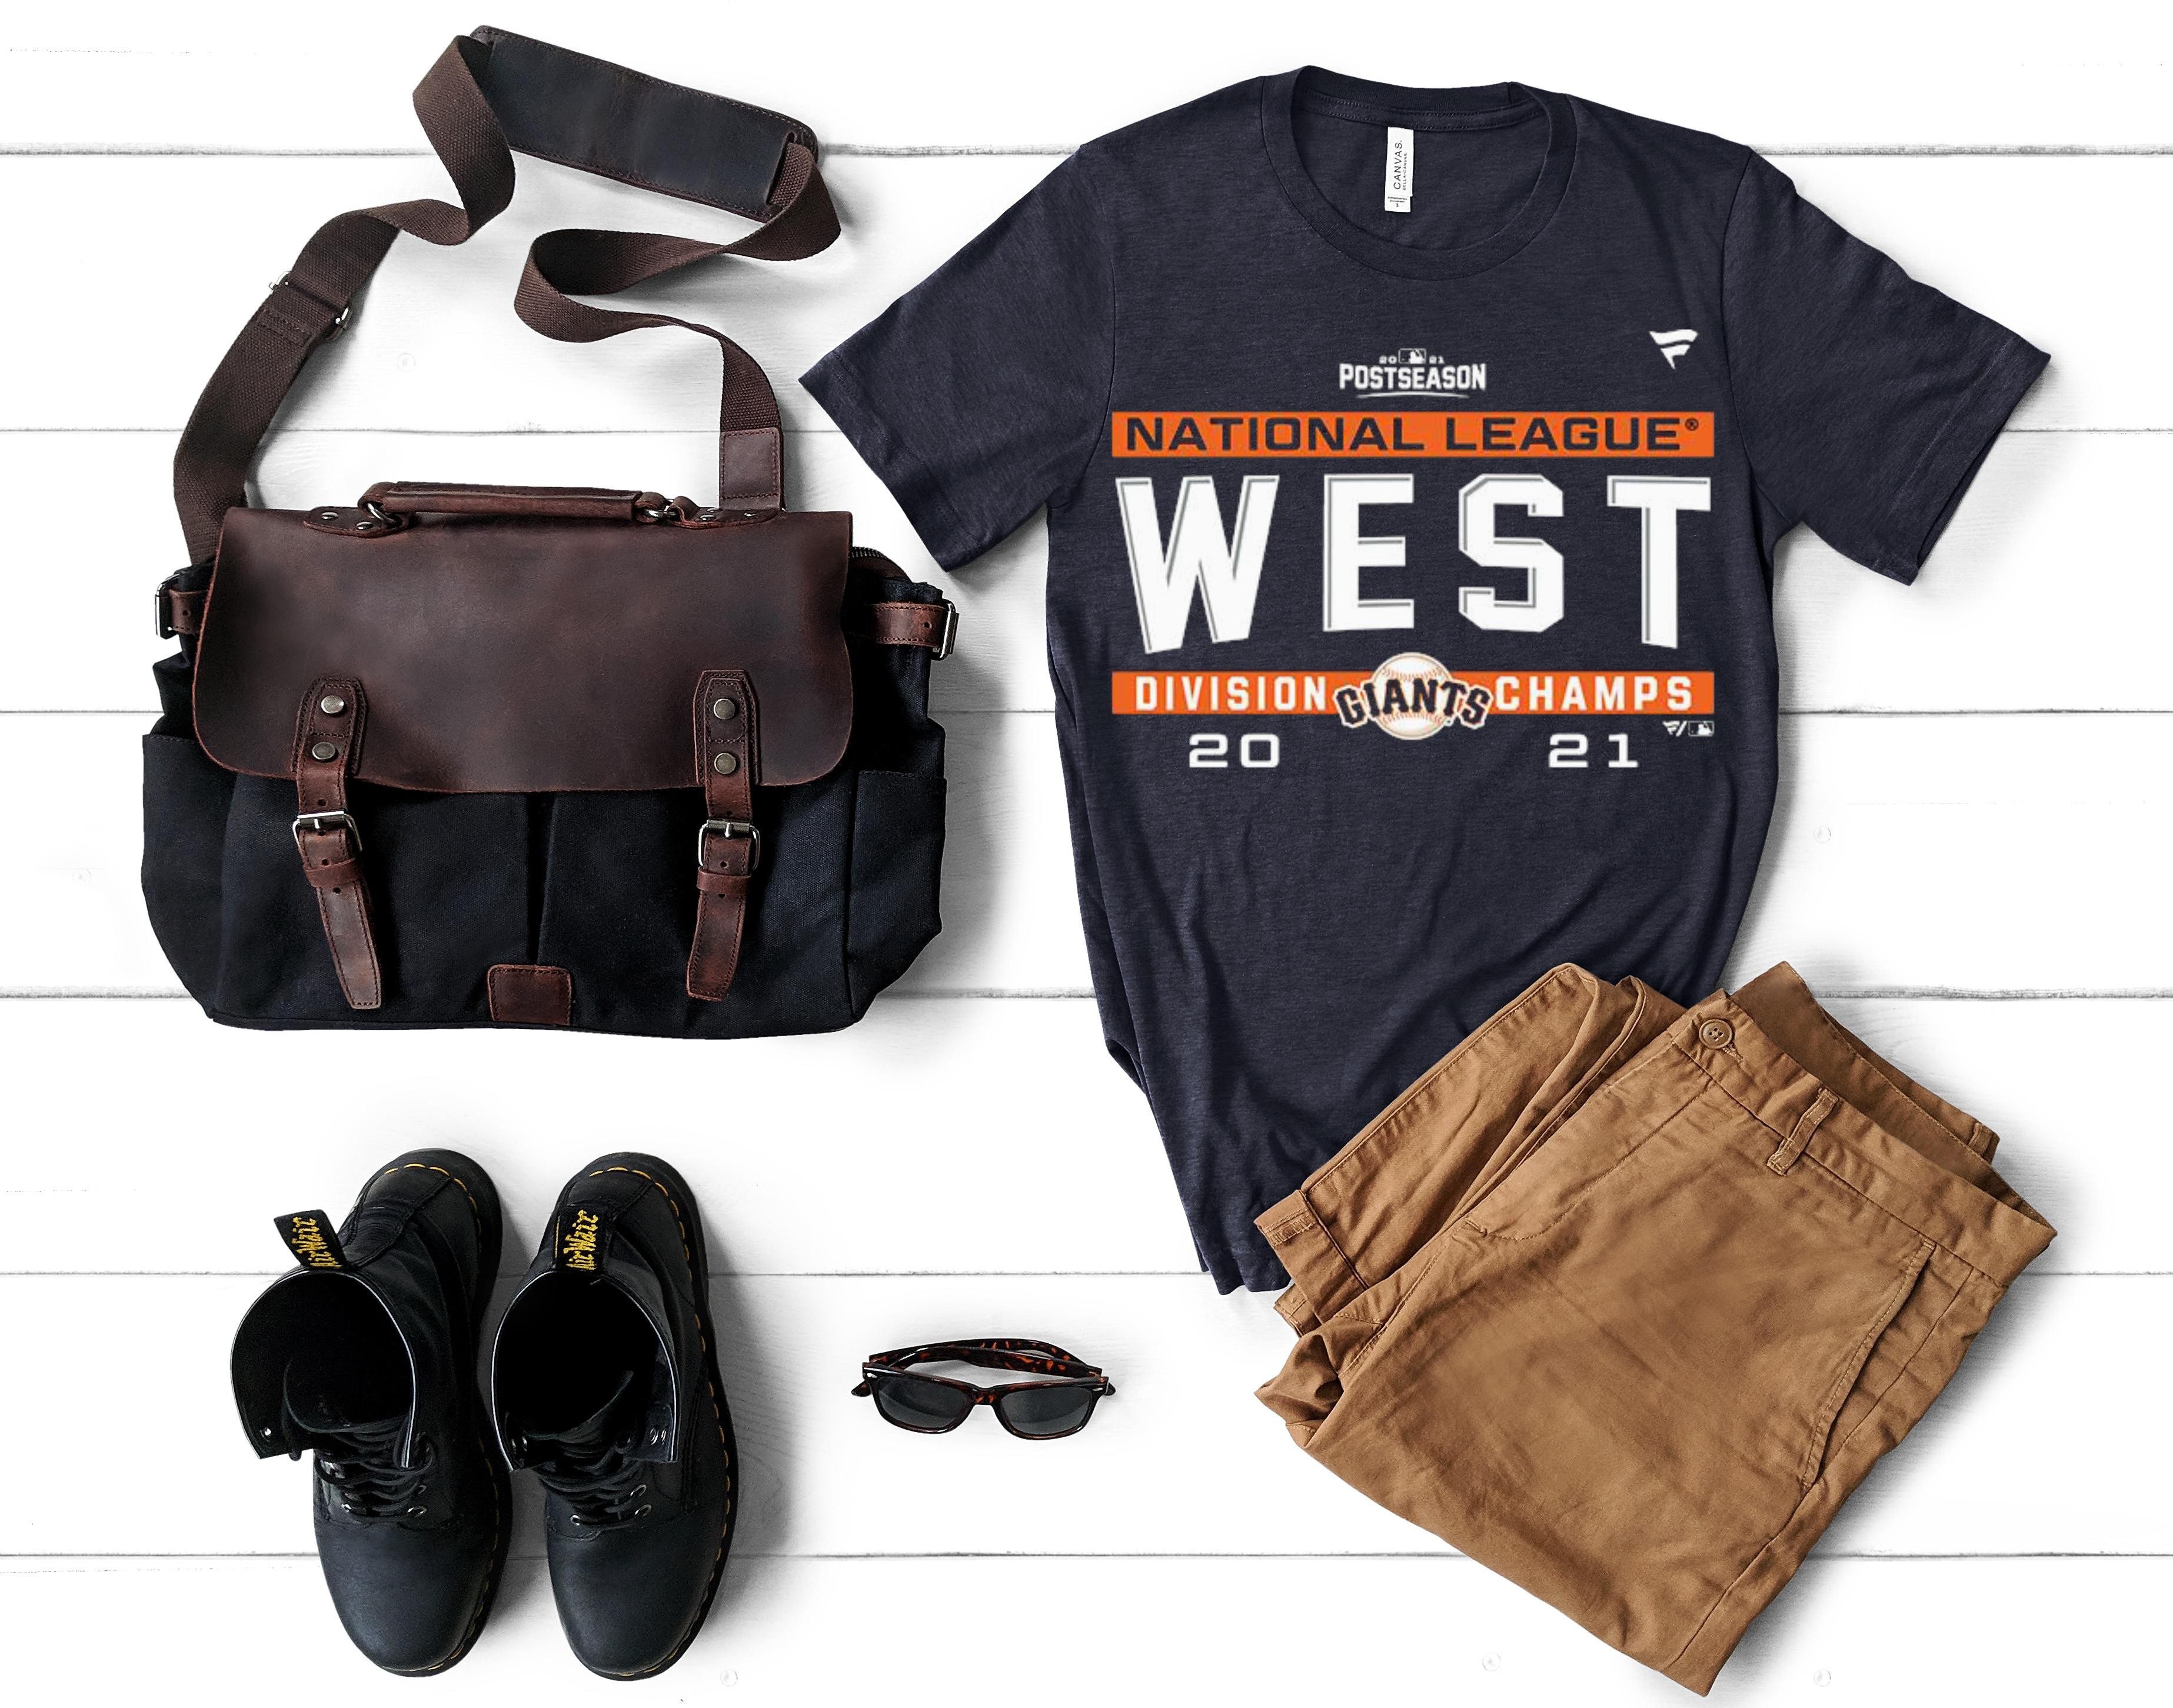 Nice San Francisco Giants Postseason National League West Division Champs 2021 shirt